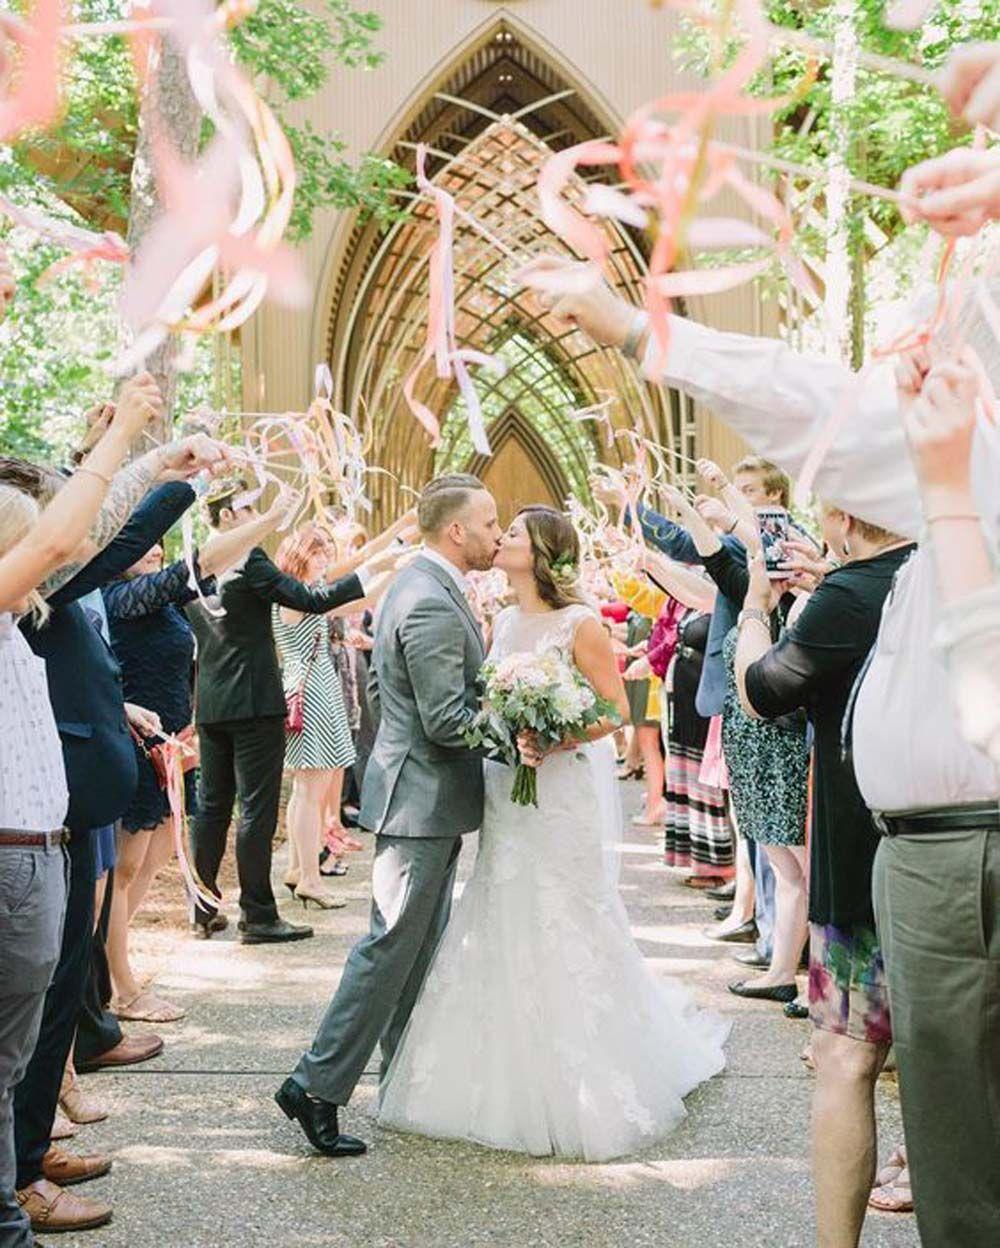 8 Amazing Wedding SendOff Ideas That Won't Create A Mess